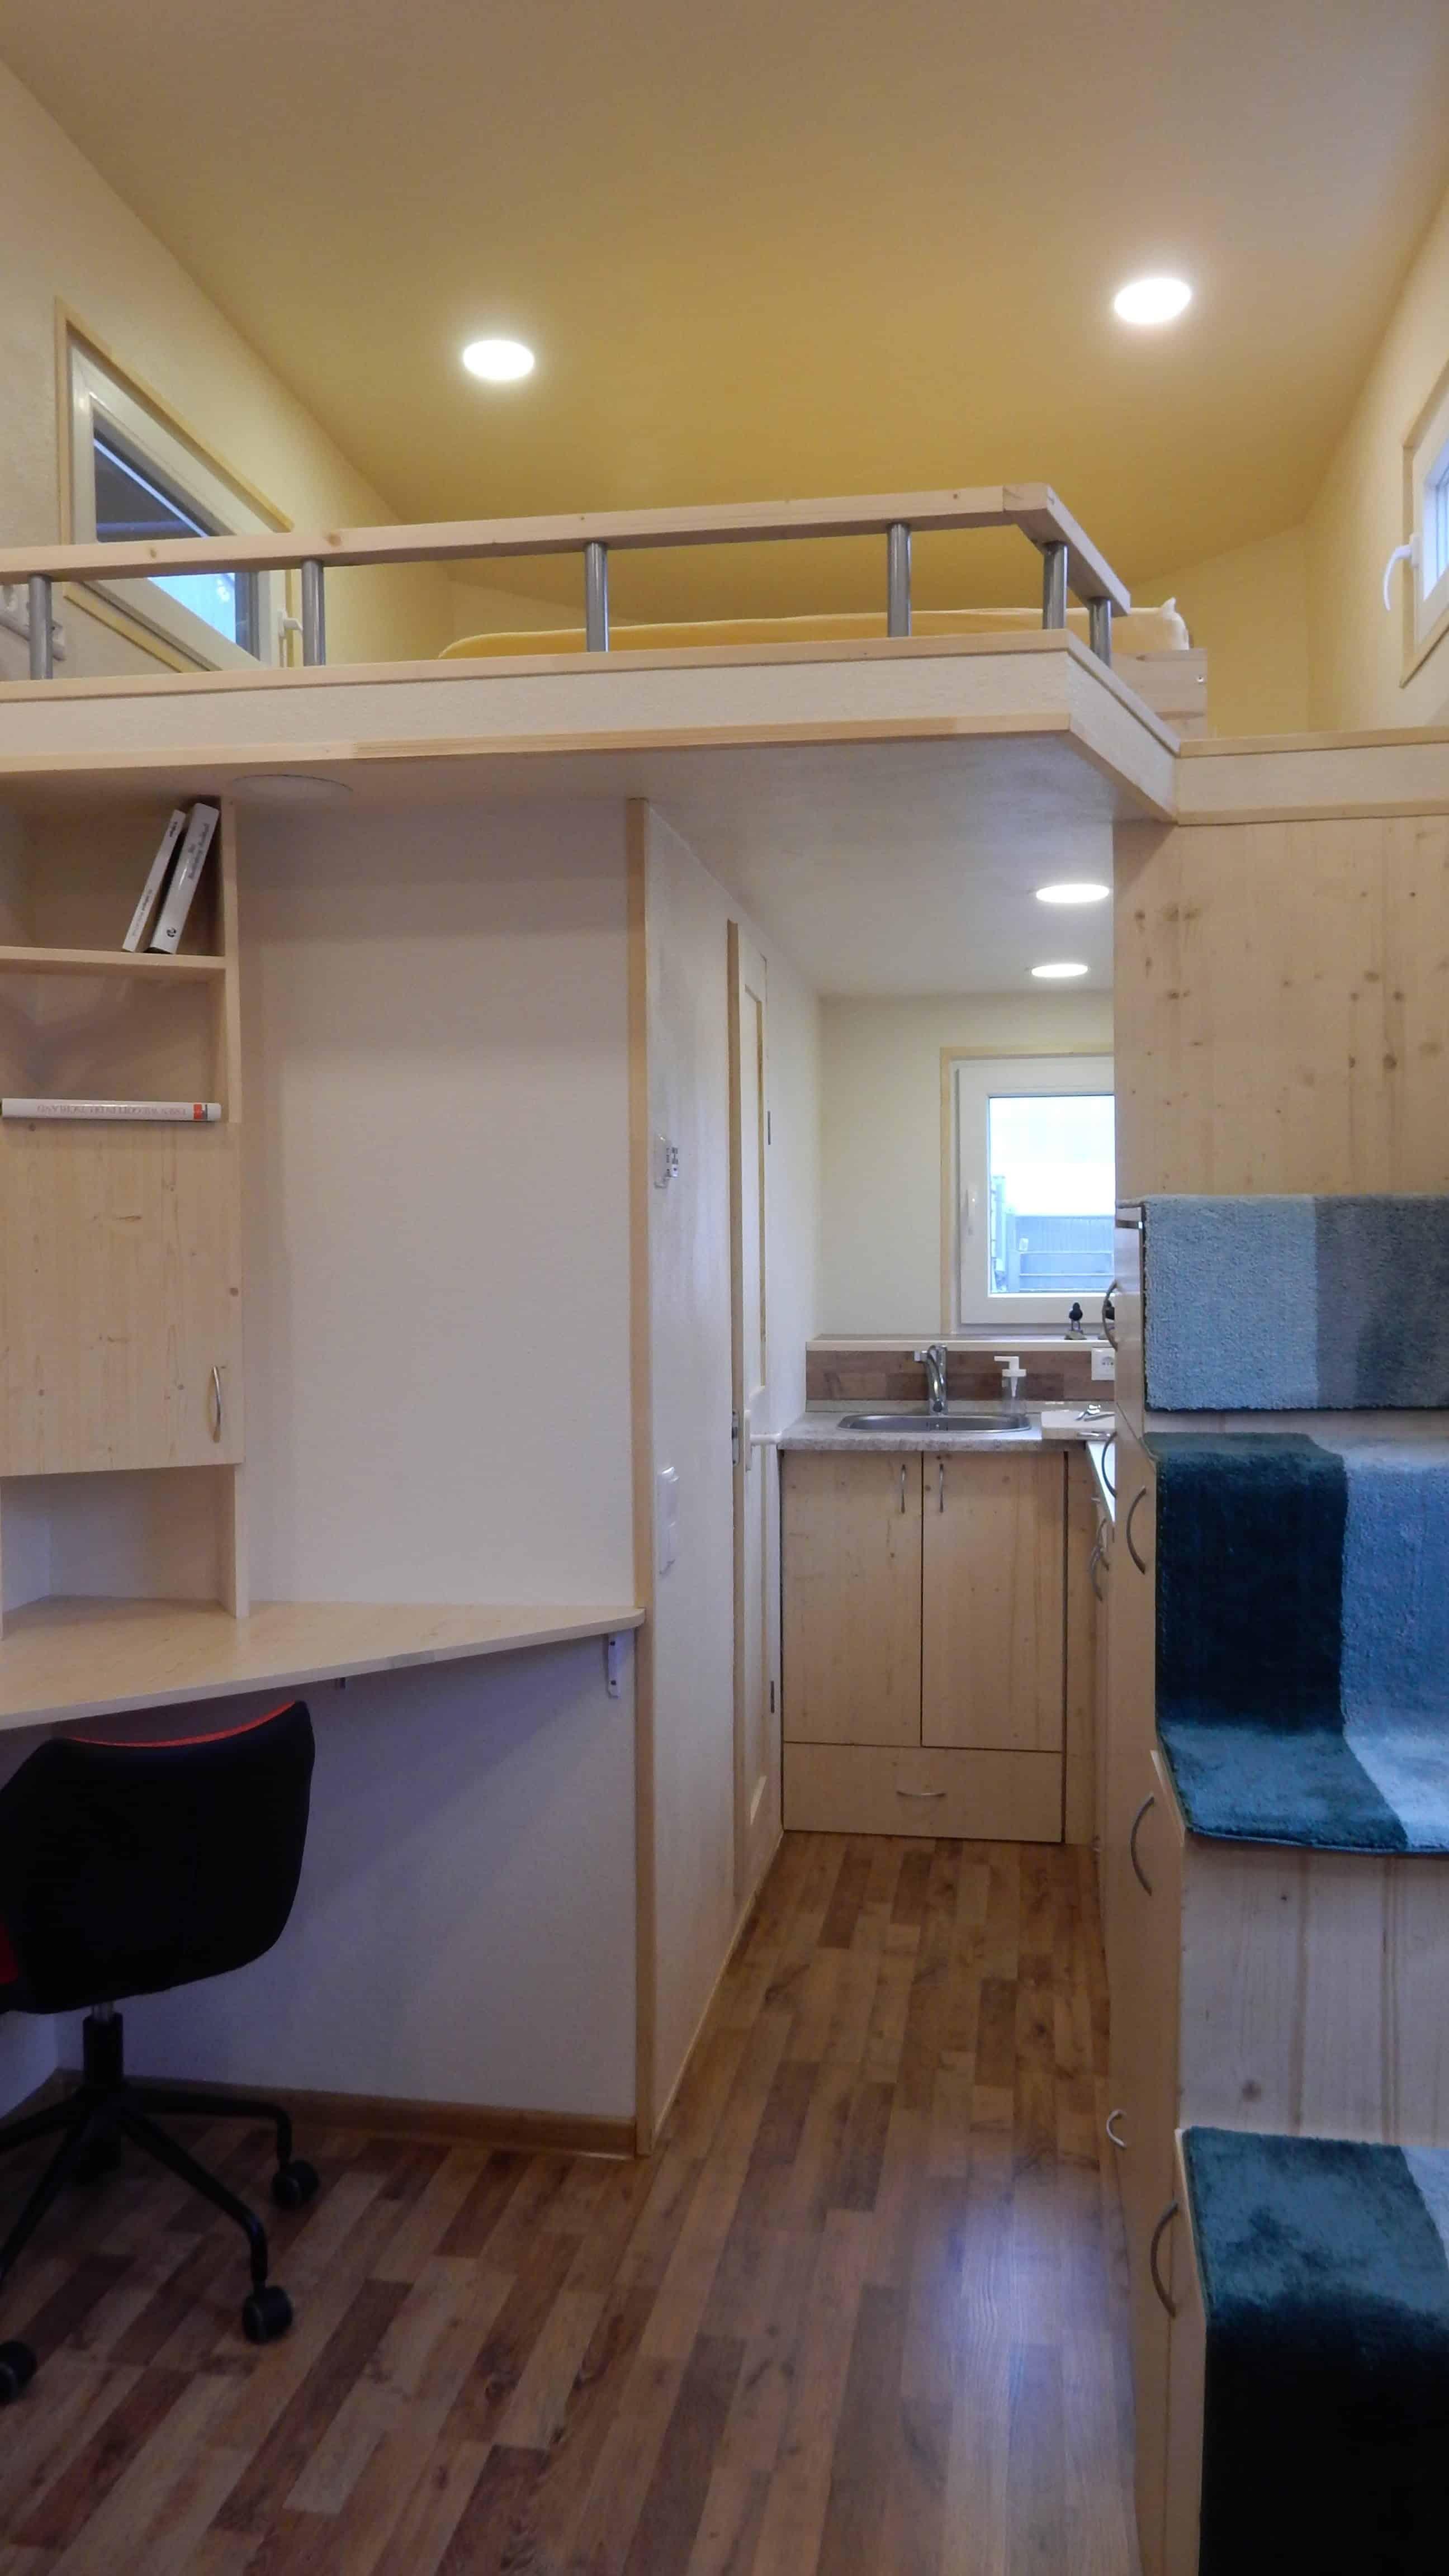 rth 171125 20 immofux com immobilien portal. Black Bedroom Furniture Sets. Home Design Ideas